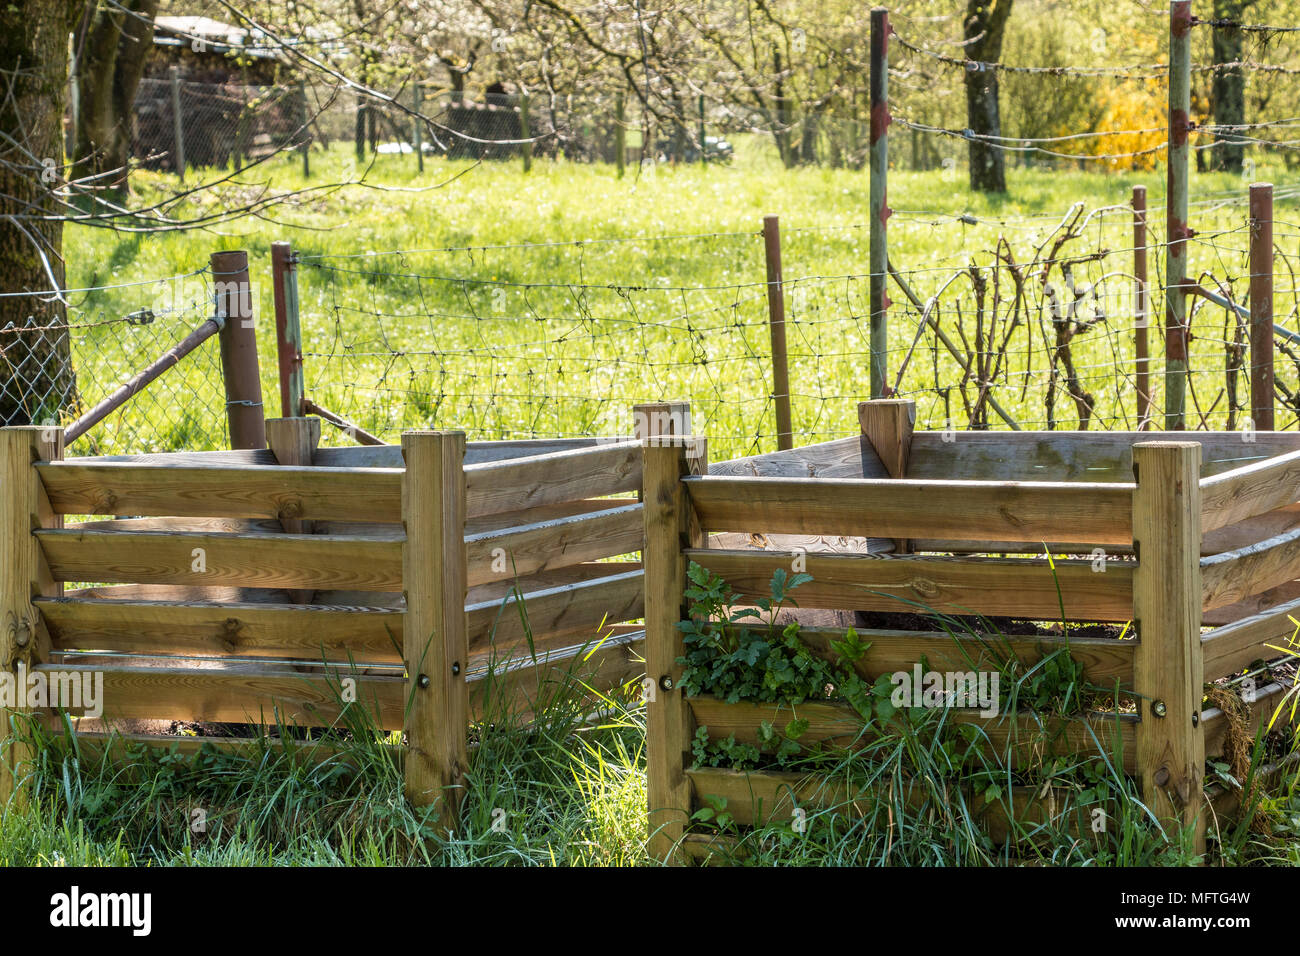 Komposthaufen mit fruchtbarem Boden in den grünen Garten Stockbild